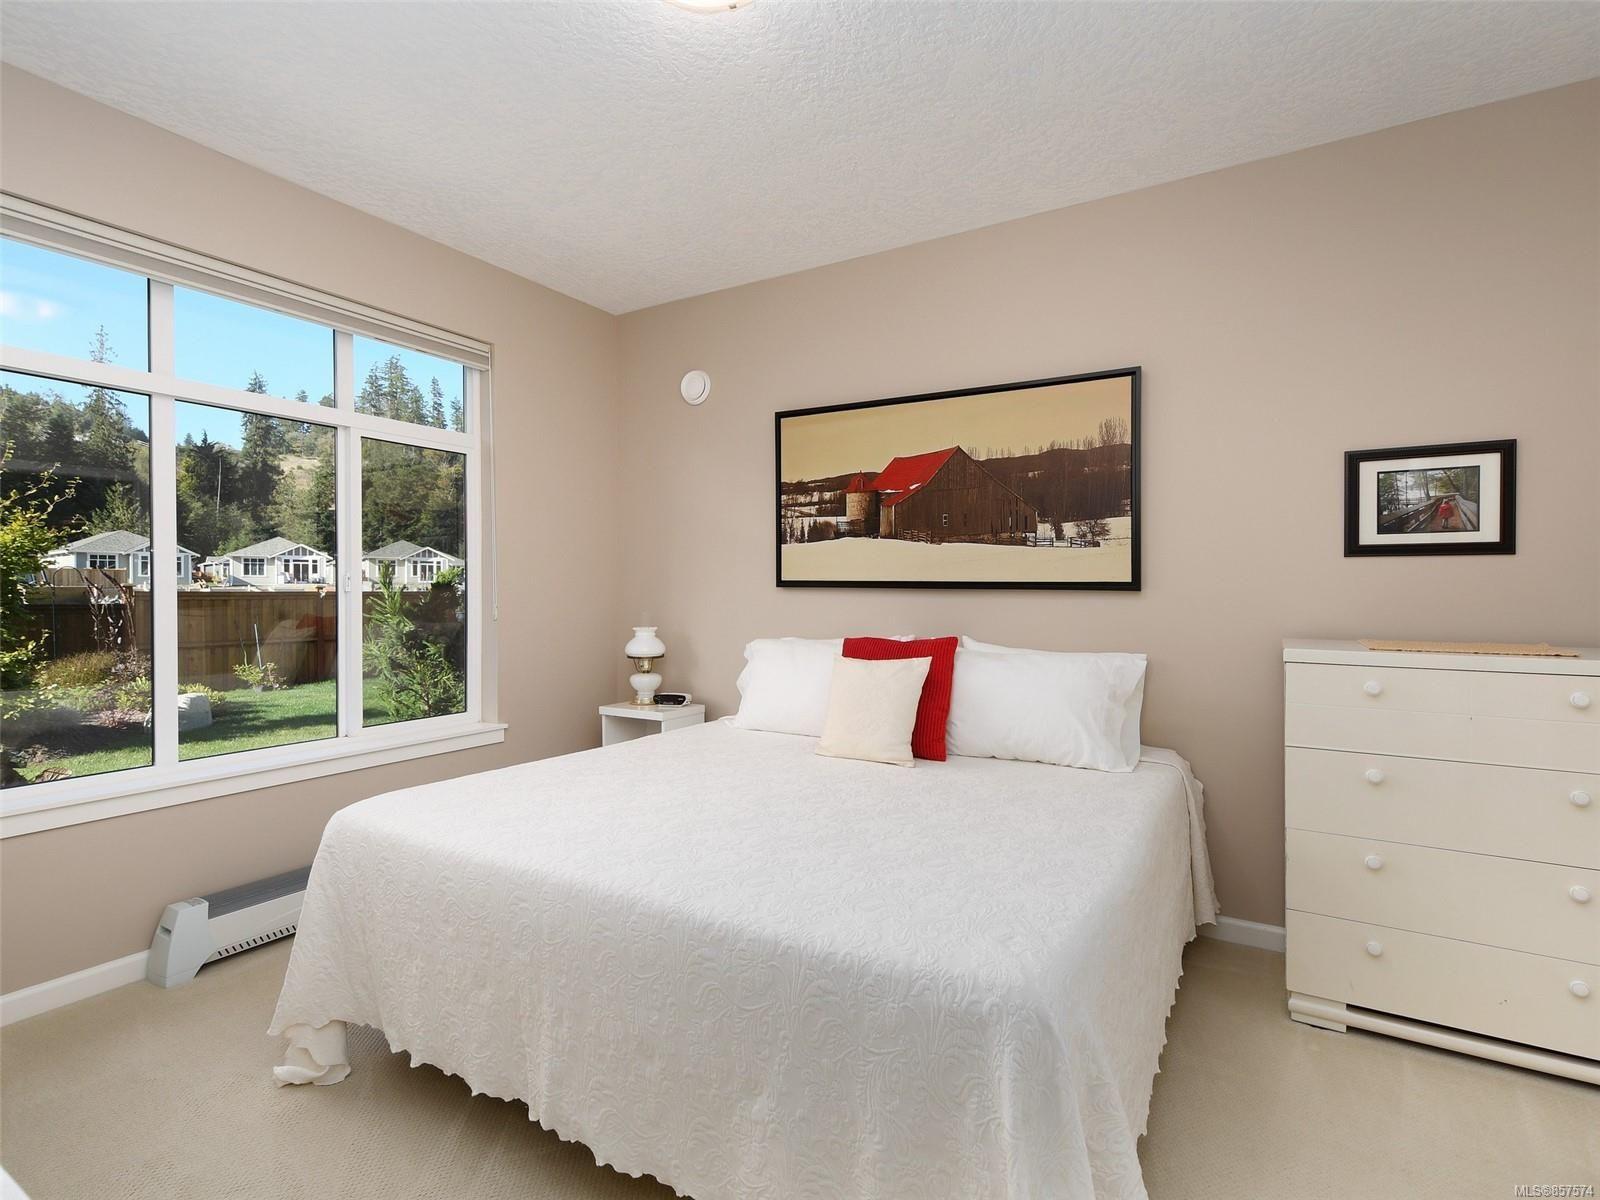 Photo 10: Photos: 6376 Shambrook Dr in : Sk Sunriver House for sale (Sooke)  : MLS®# 857574